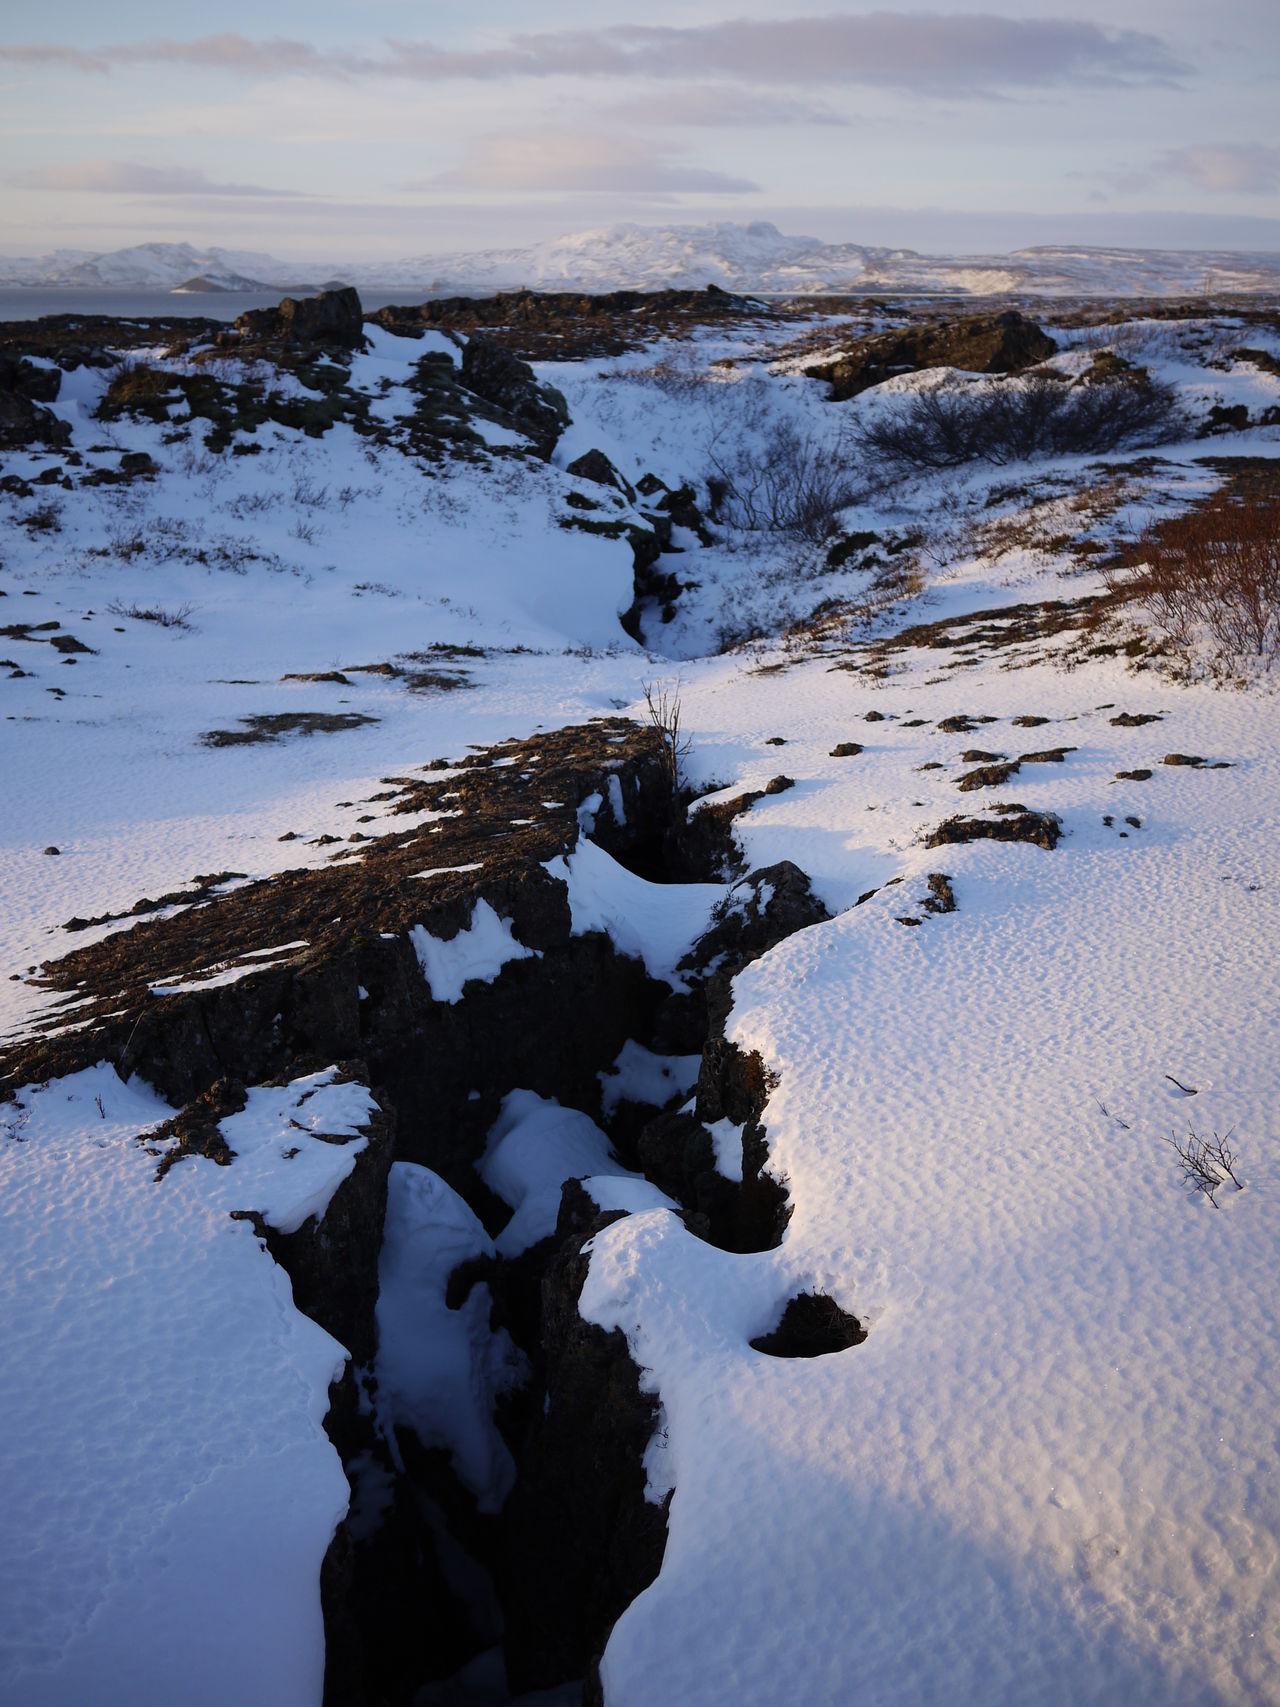 2010 Cold Temperature Frozen Ice Island Lake Landscape Nature Outdoors Sky Snow Thingvellir Thingvellir National Park Water Winter World Heritage þingvellir Þingvellir National Park シンクヴェトリル 世界遺産 地球の割れ目 雪 ぎゃう